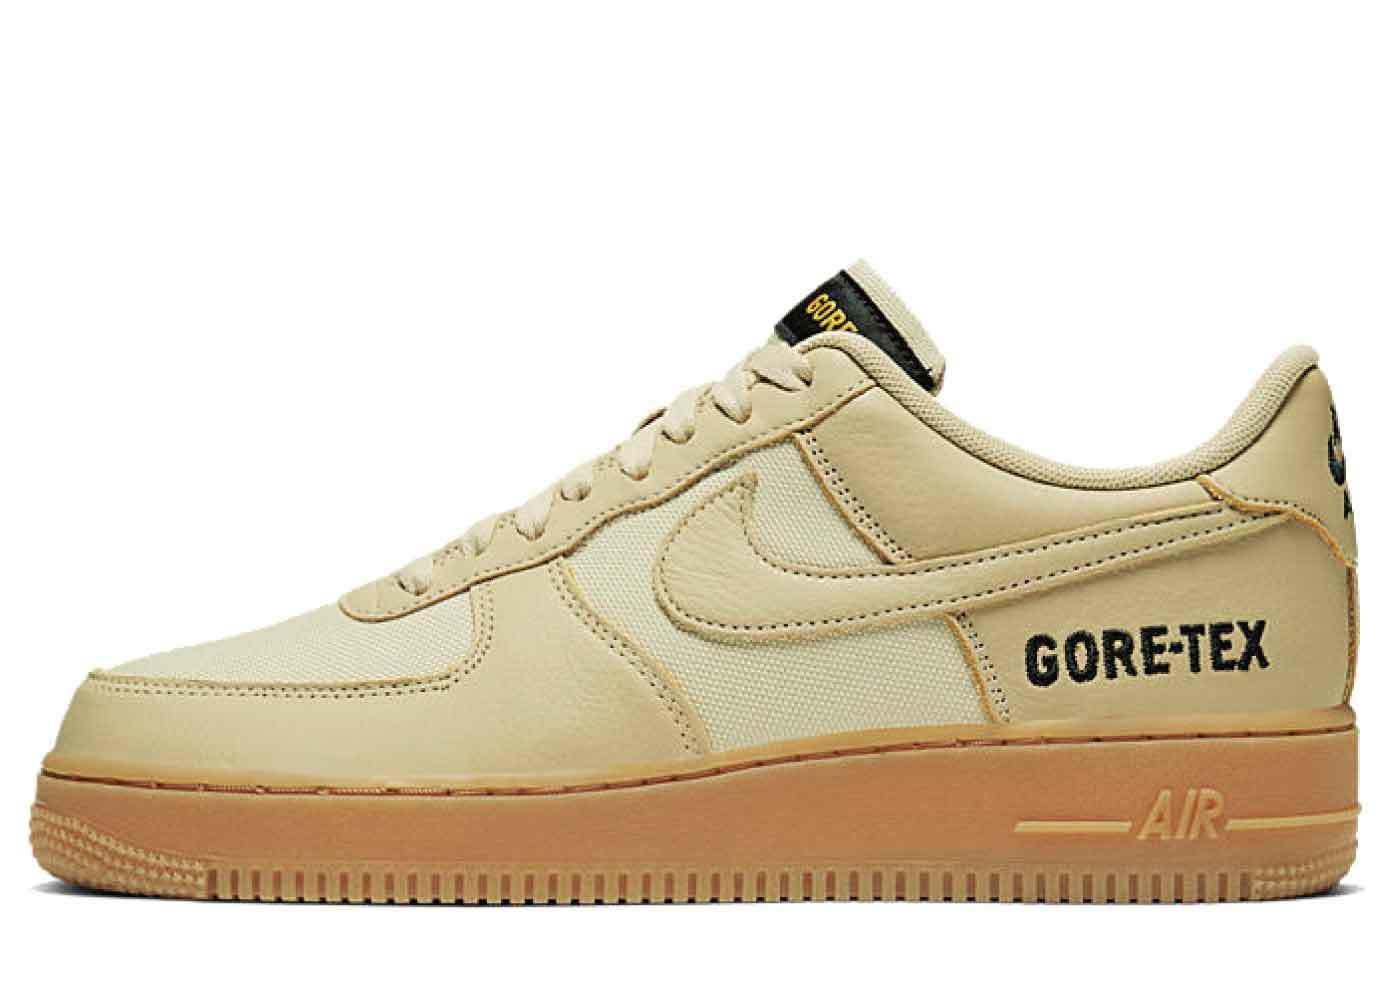 Nike Air Force 1 Low Gore-Tex Team Goldの写真